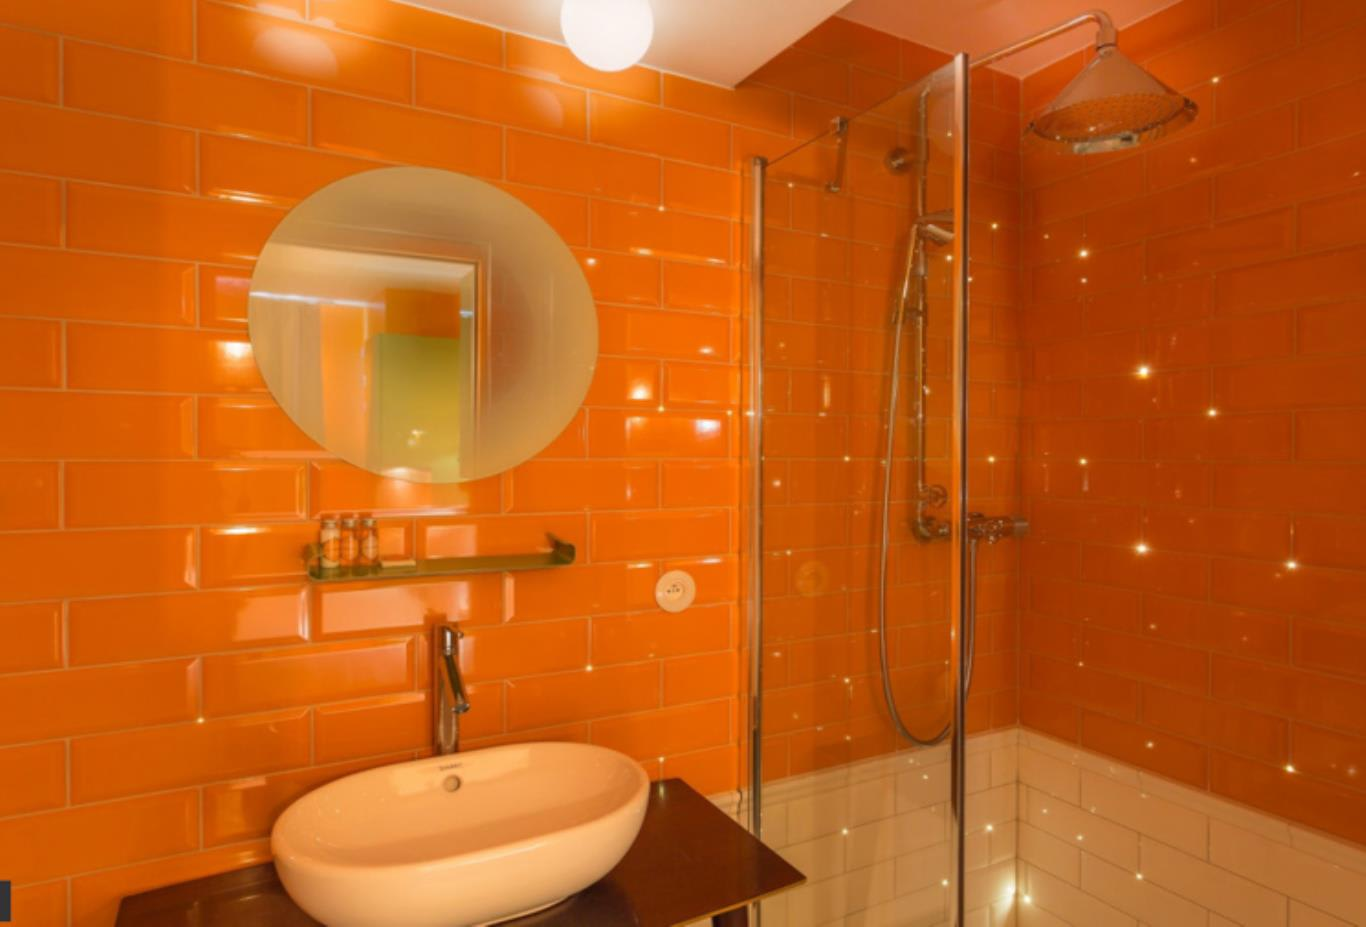 Insolite-Room-shower